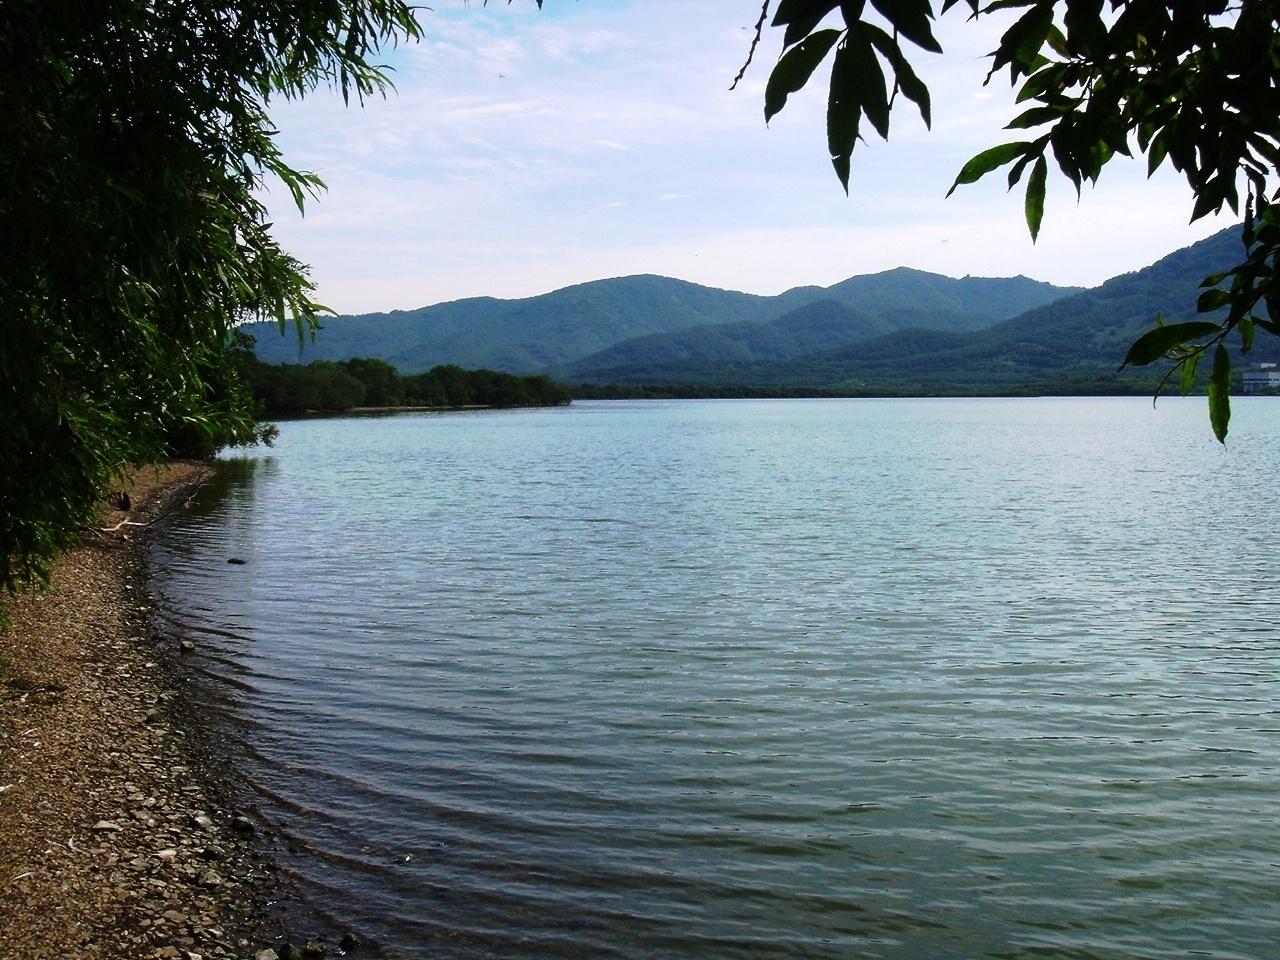 Озеро Халатырское.